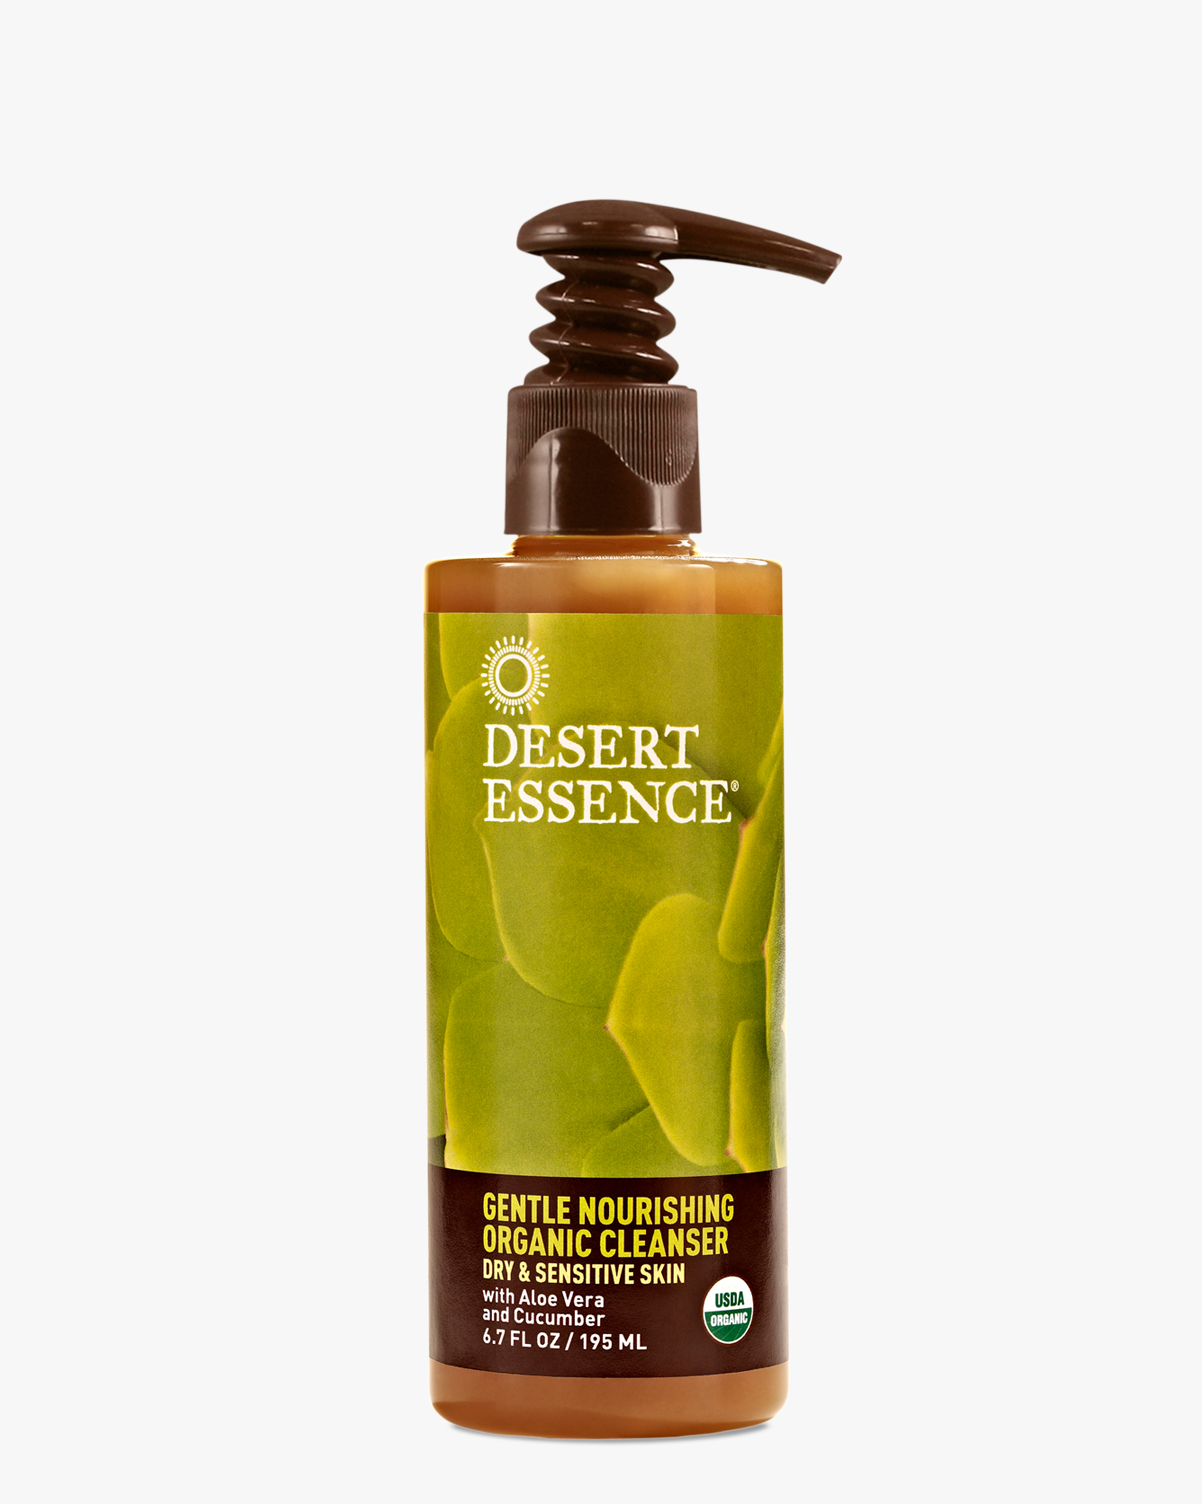 Desert Essence coupon: Desert Essence Gentle Nourishing Organic Cleanser, 6.7 fl oz. | Vegan | Gluten-Free